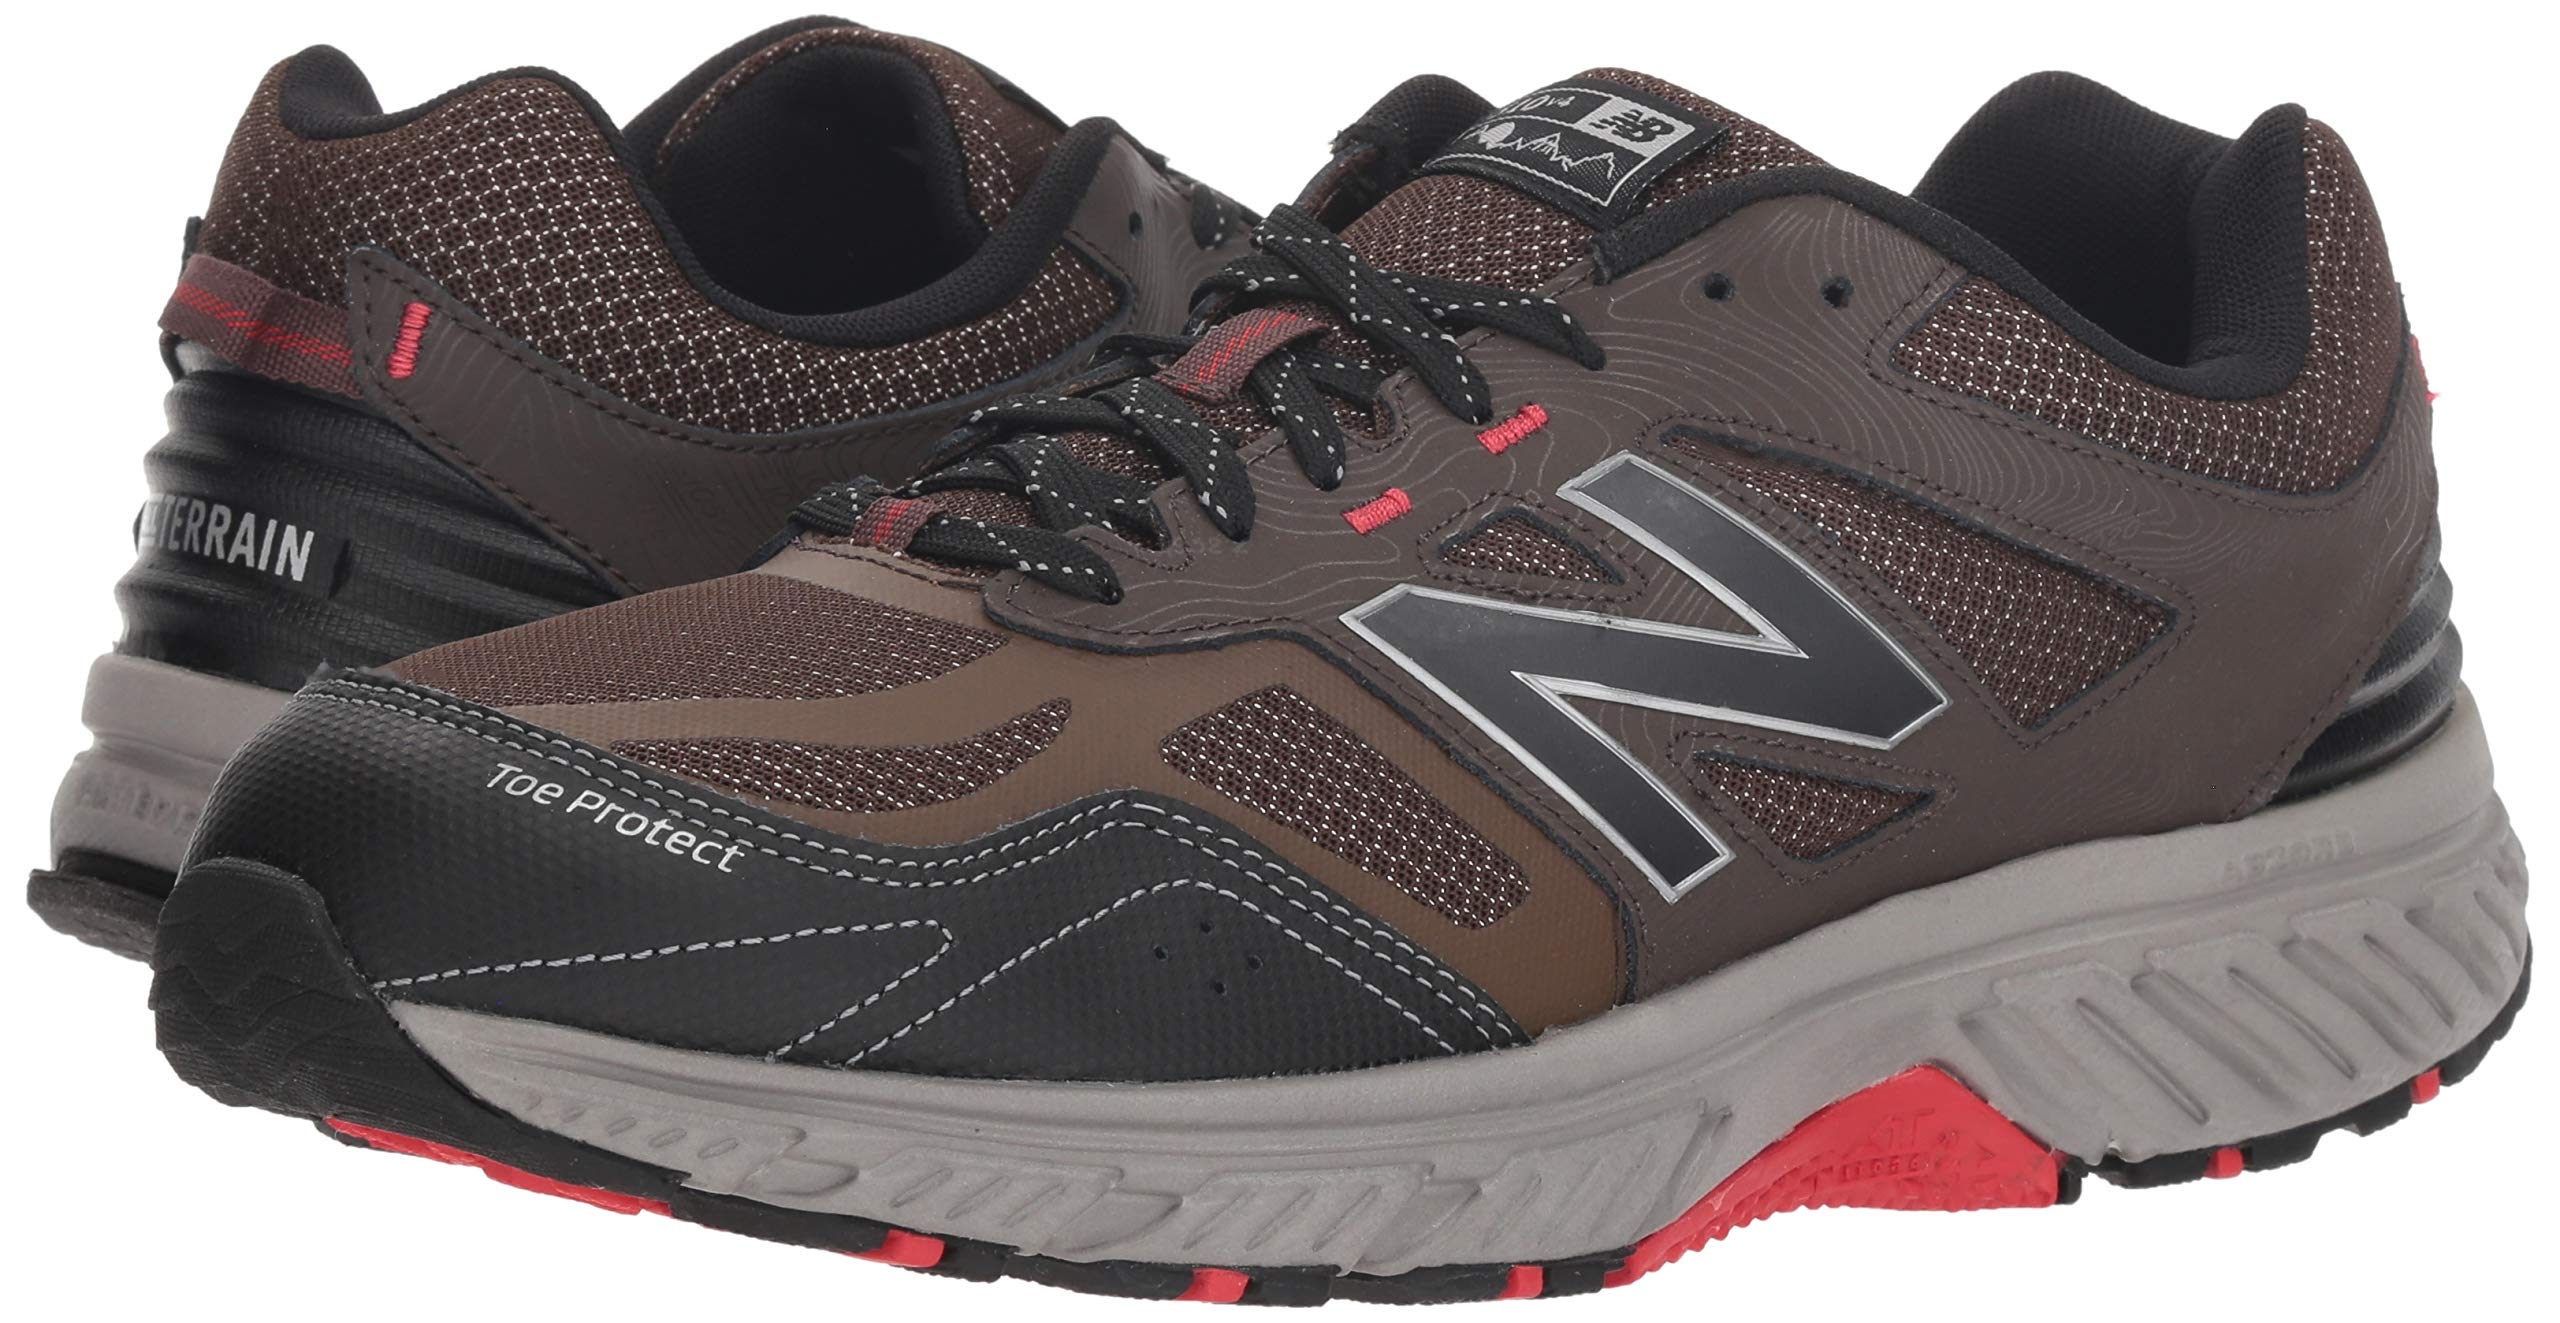 New Balance Men's 510v4 Cushioning Trail Running Shoe, Chocolate/Black/Team red, 7 D US by New Balance (Image #6)